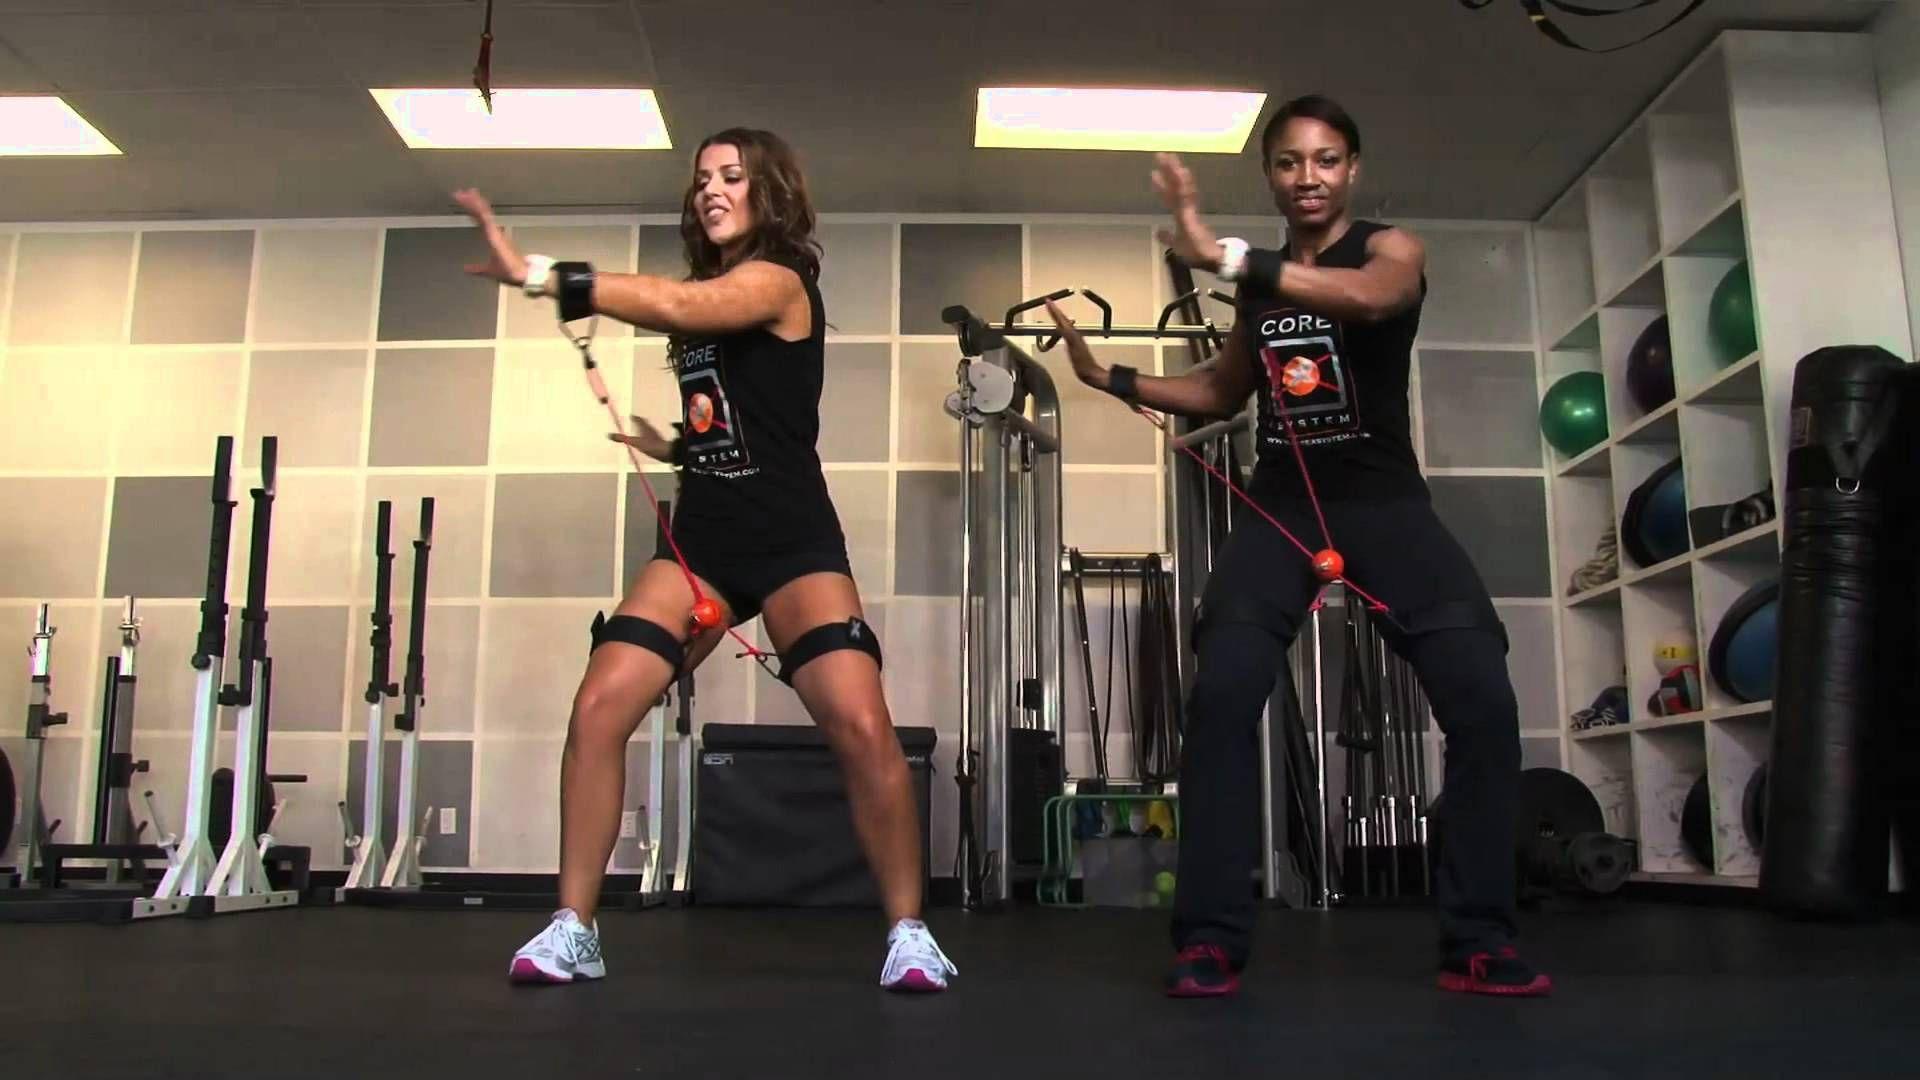 Core X Sytem Whole Body Workout Whole Body Workouts Best Core Workouts Fitness Body